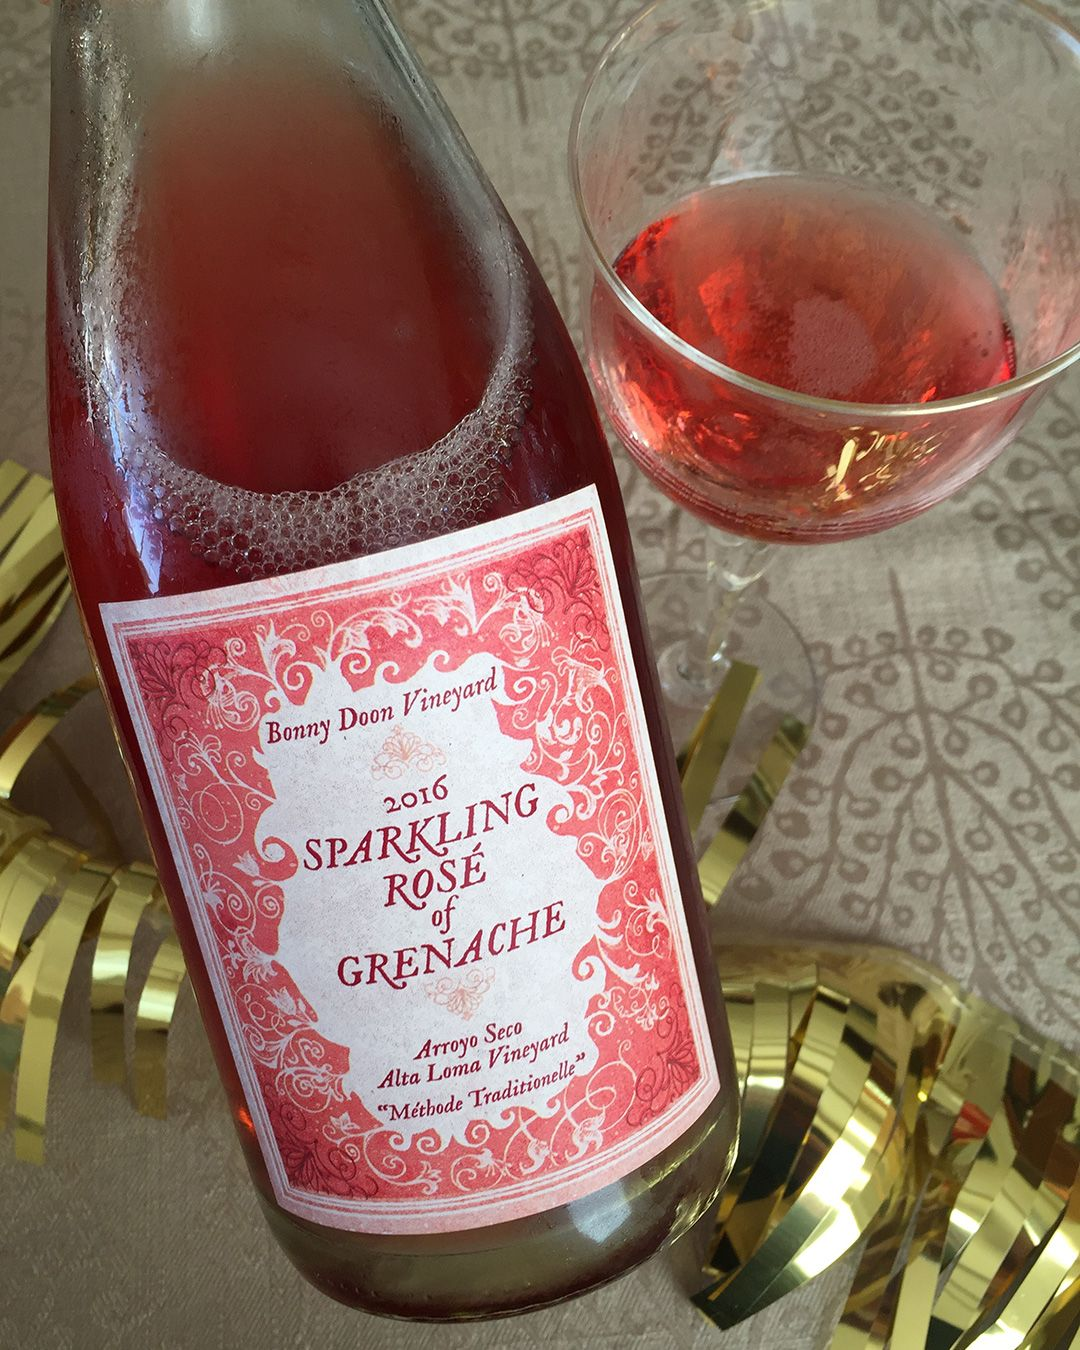 2016 Sparkling Rose Of Grenache By Bonny Doon Vineyard 100 Grenache Exceedingly Food Friendly And Fun Sparkling Wine Grenache Wine Bottle